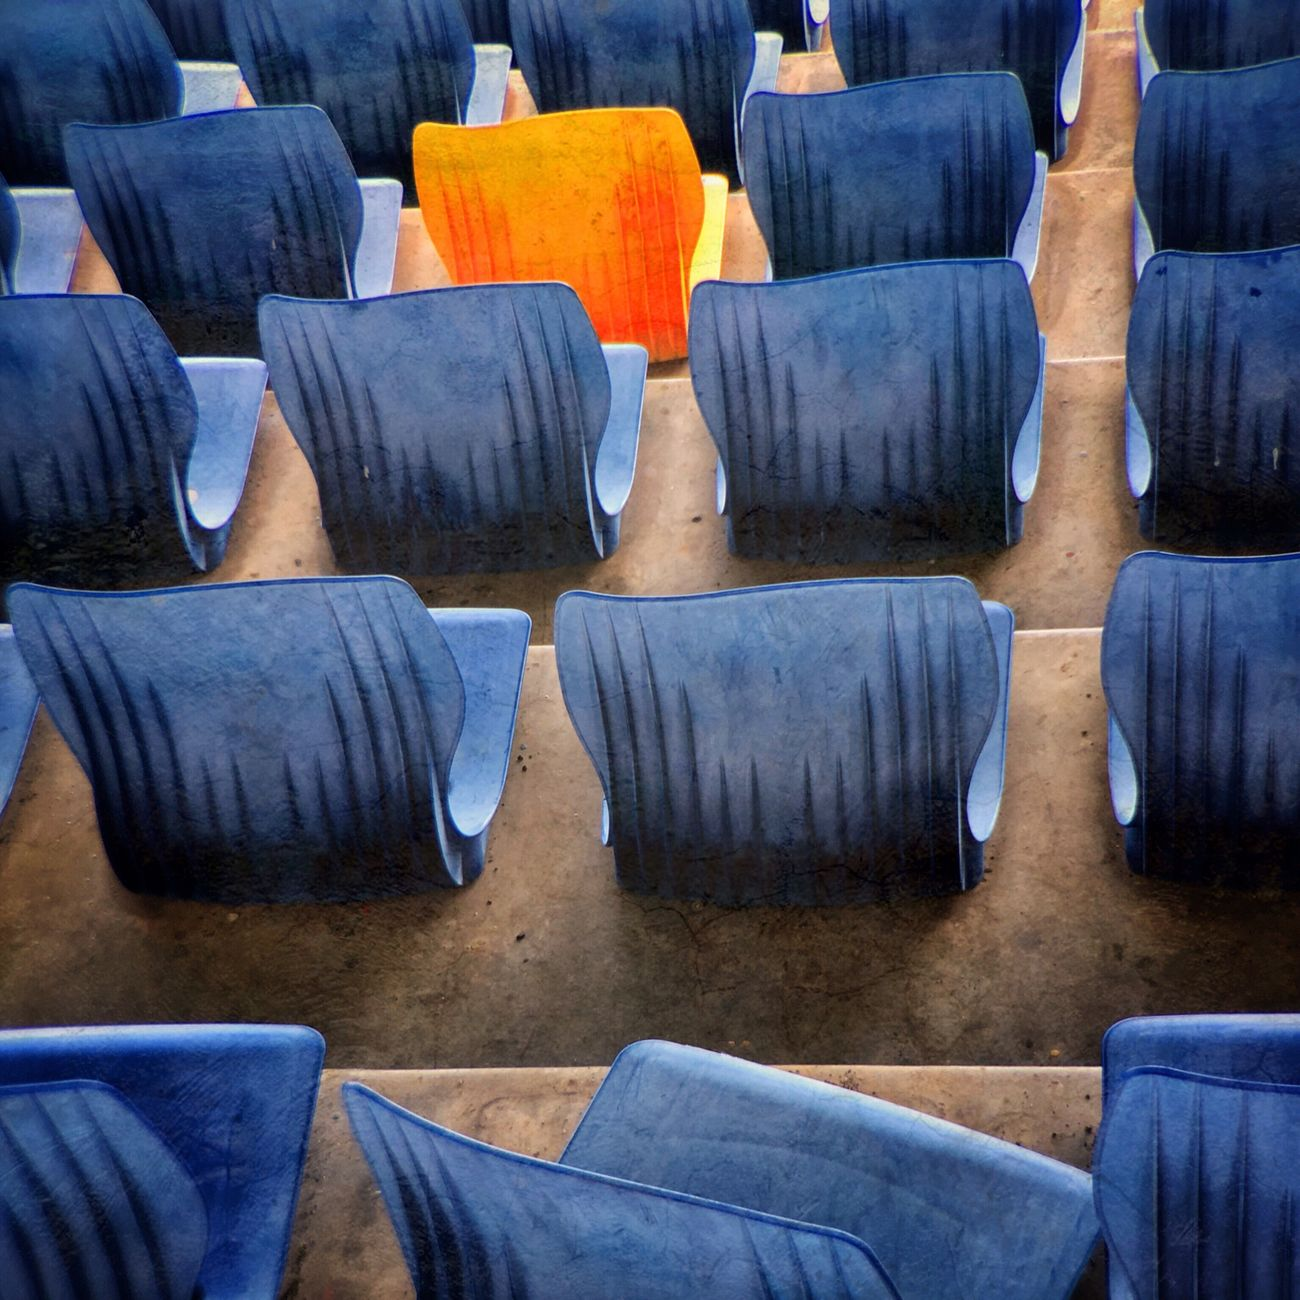 SUBVERSIVE Architectural Blue Design In A Row Metaphor Outdoors Seats Stadium Symbolism Yellow